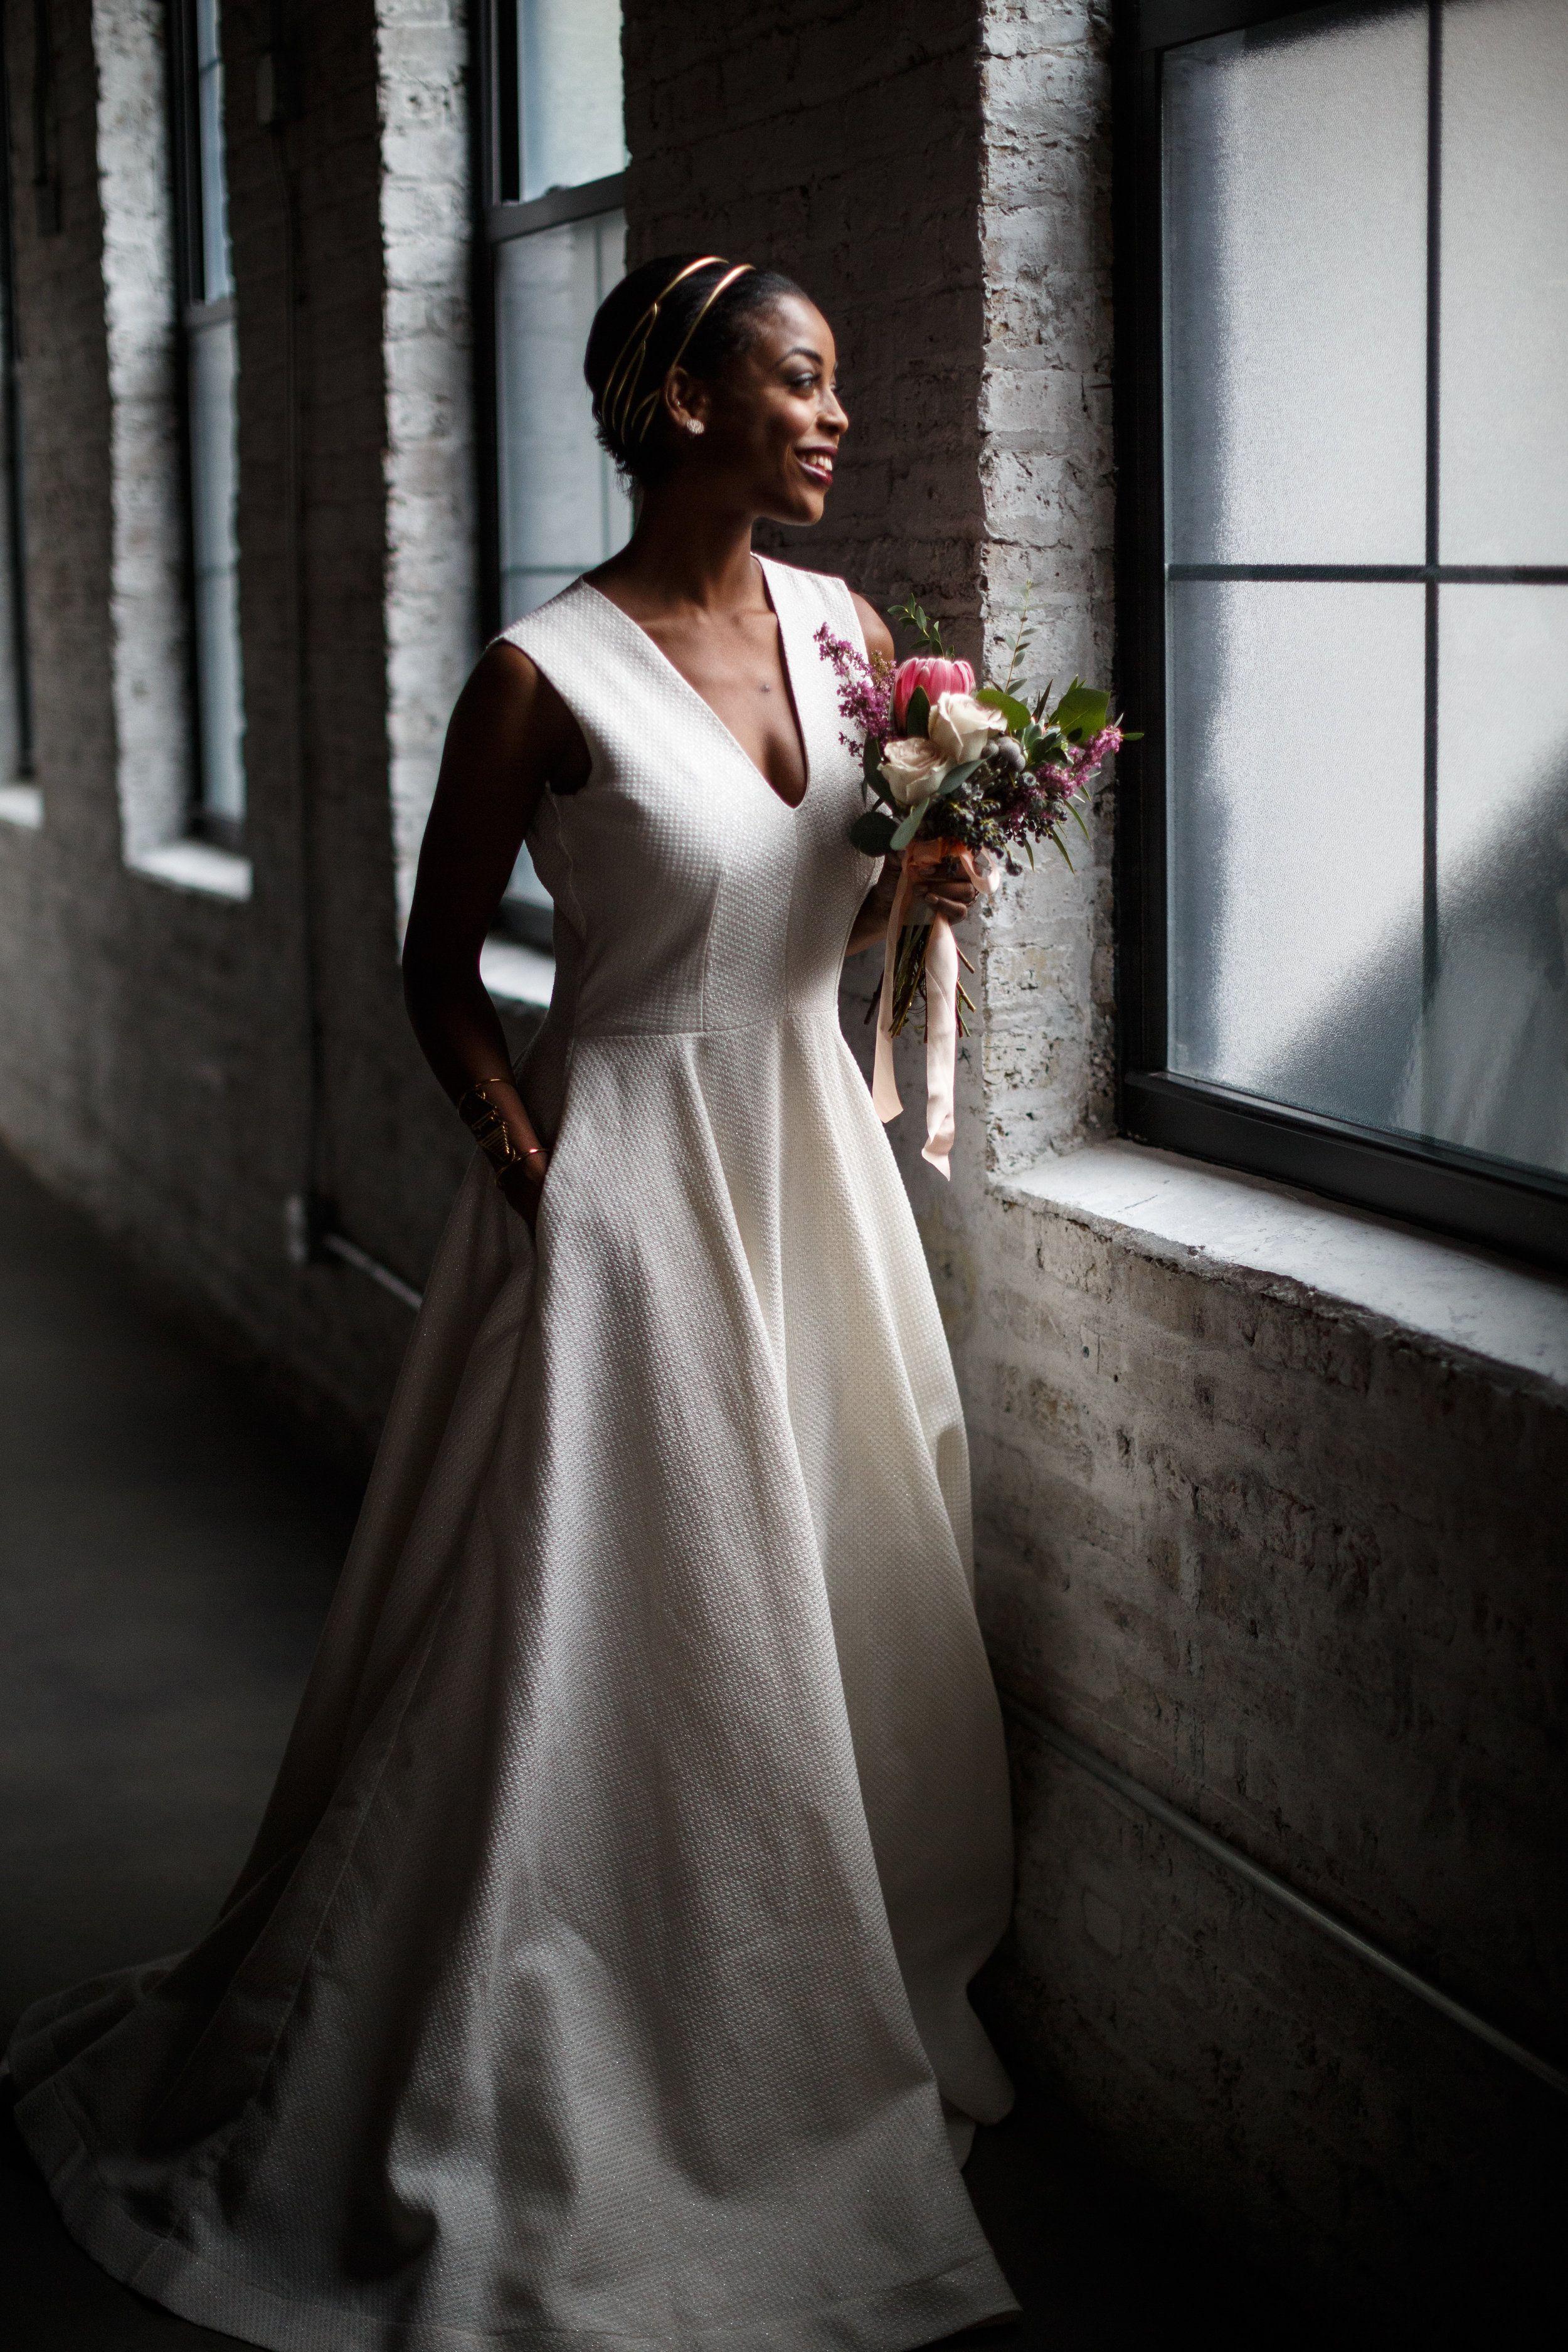 Chicago wedding dresses  Wedding dresses with pockets  Chicago Weddings  Pinterest